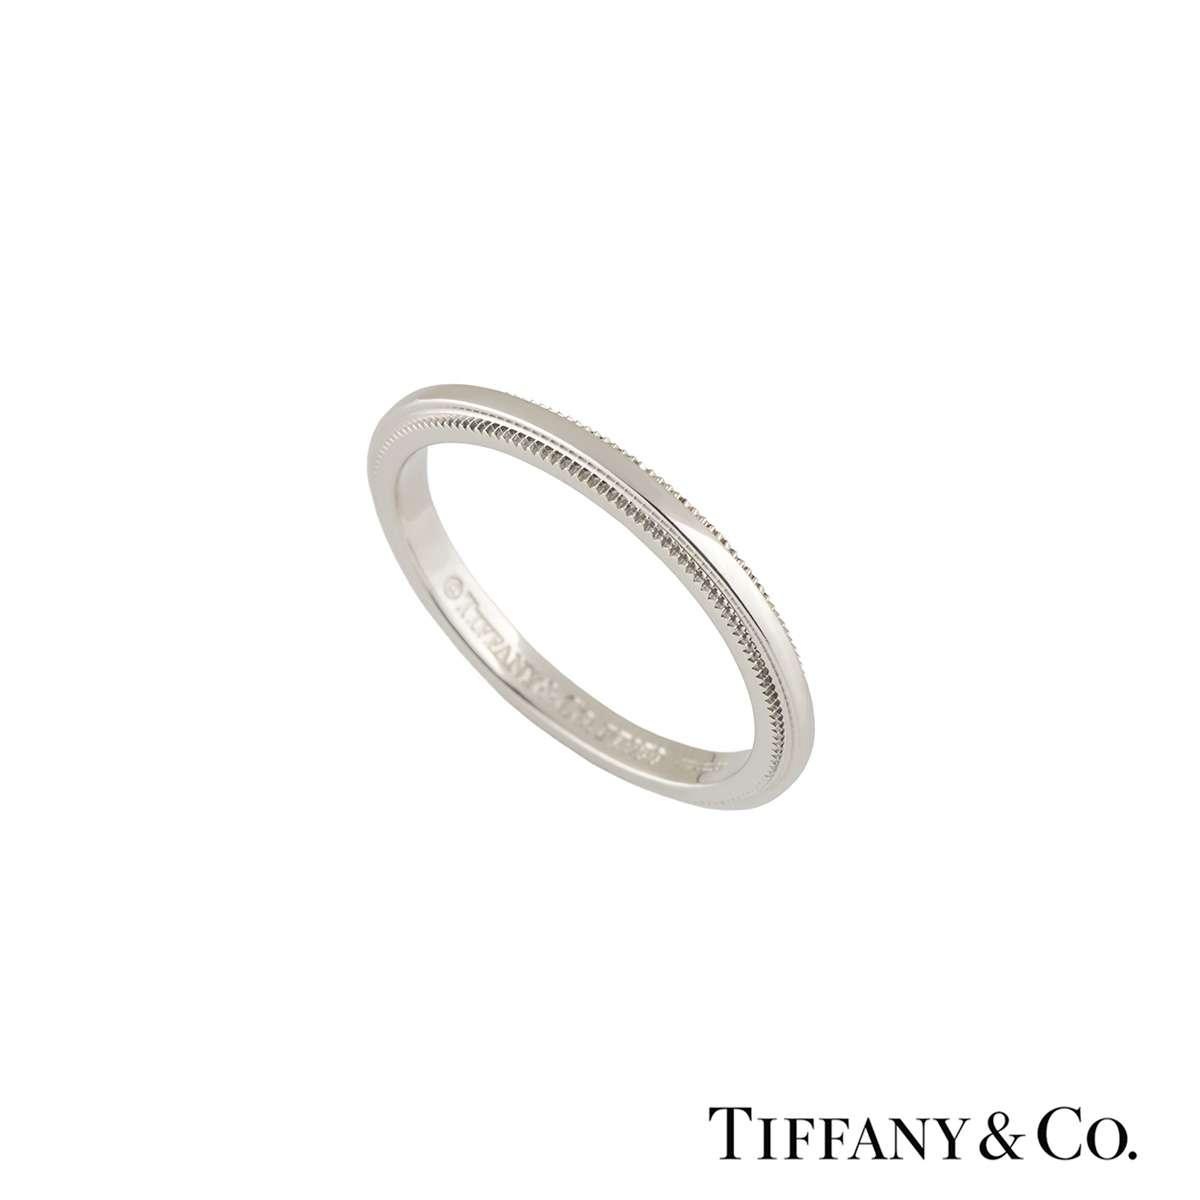 Tiffany & Co. Platinum Classic Wedding Band